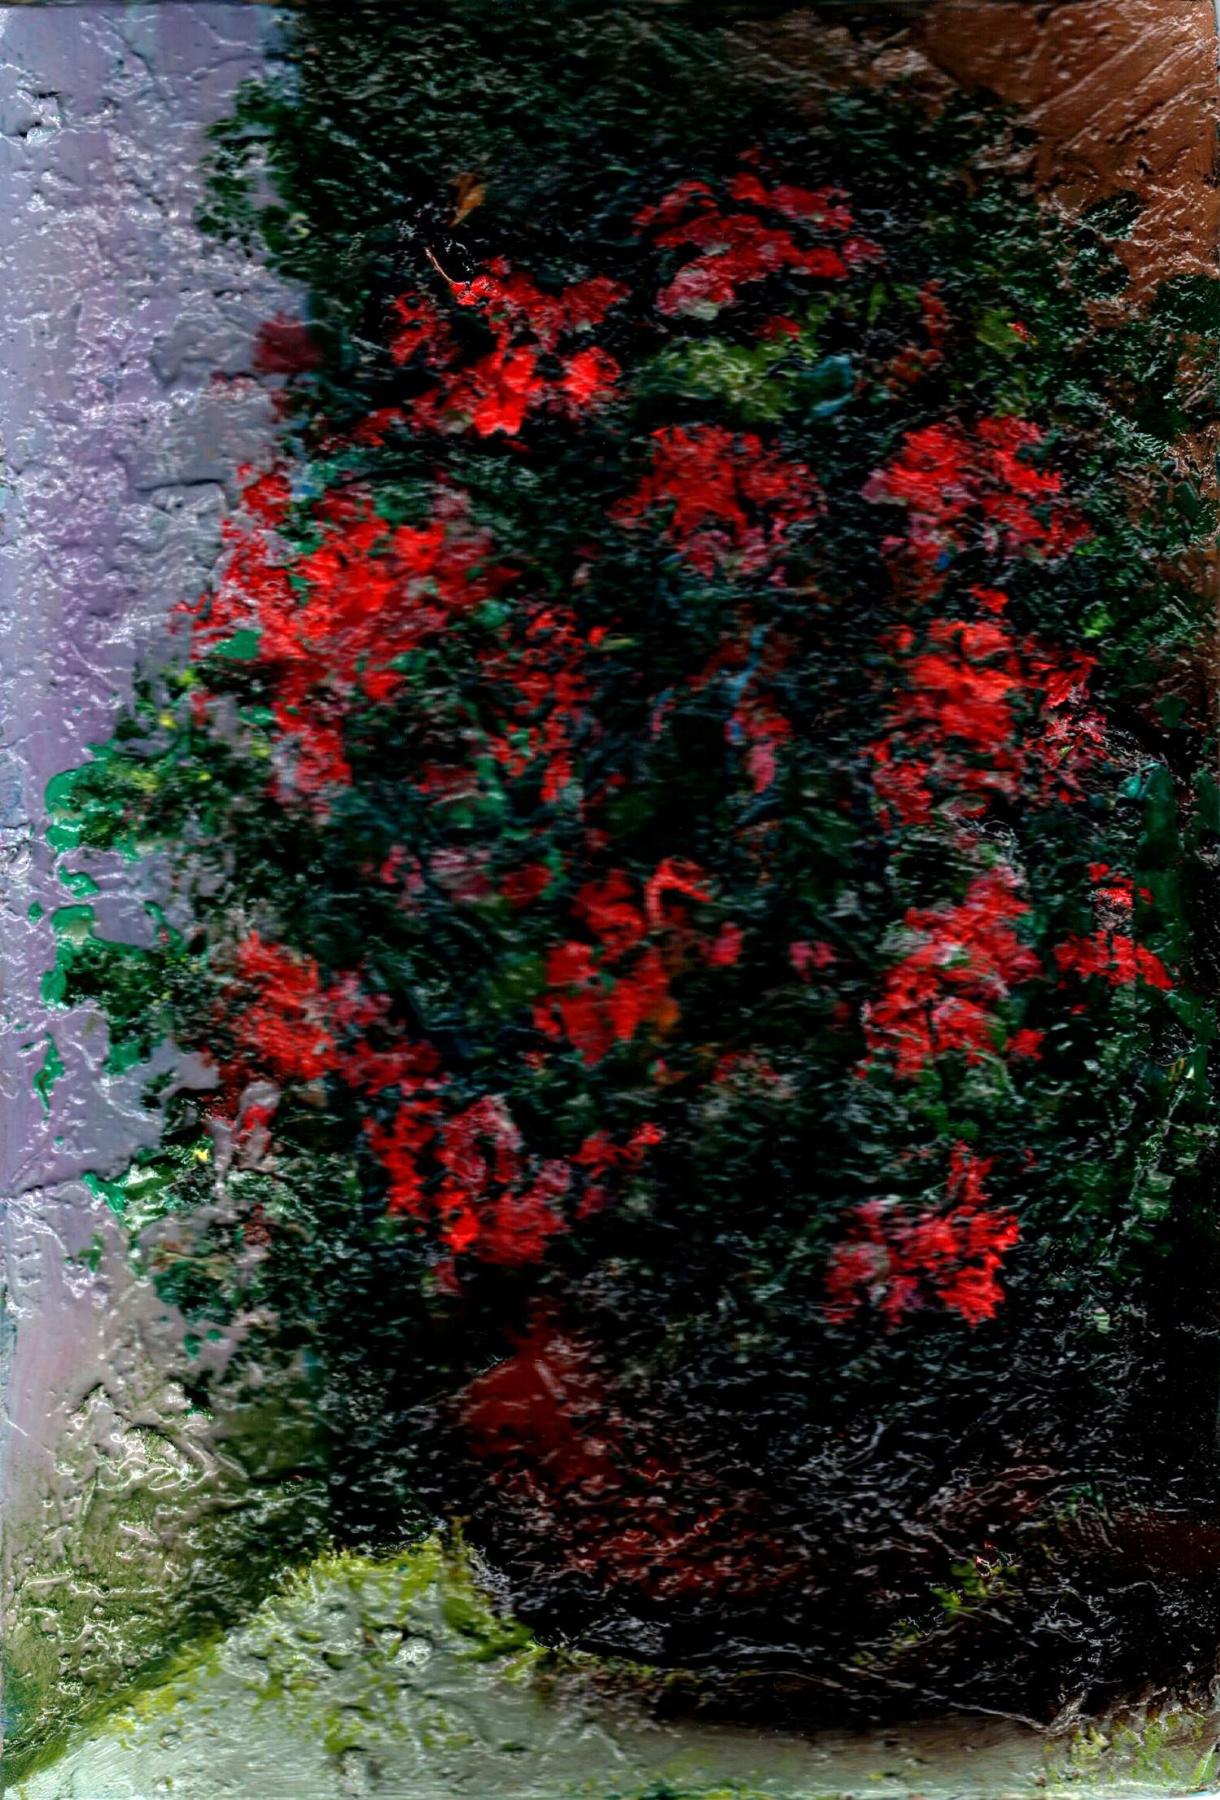 Vladimir Vasilyevich Abaimov. Red Flowers in a Pot